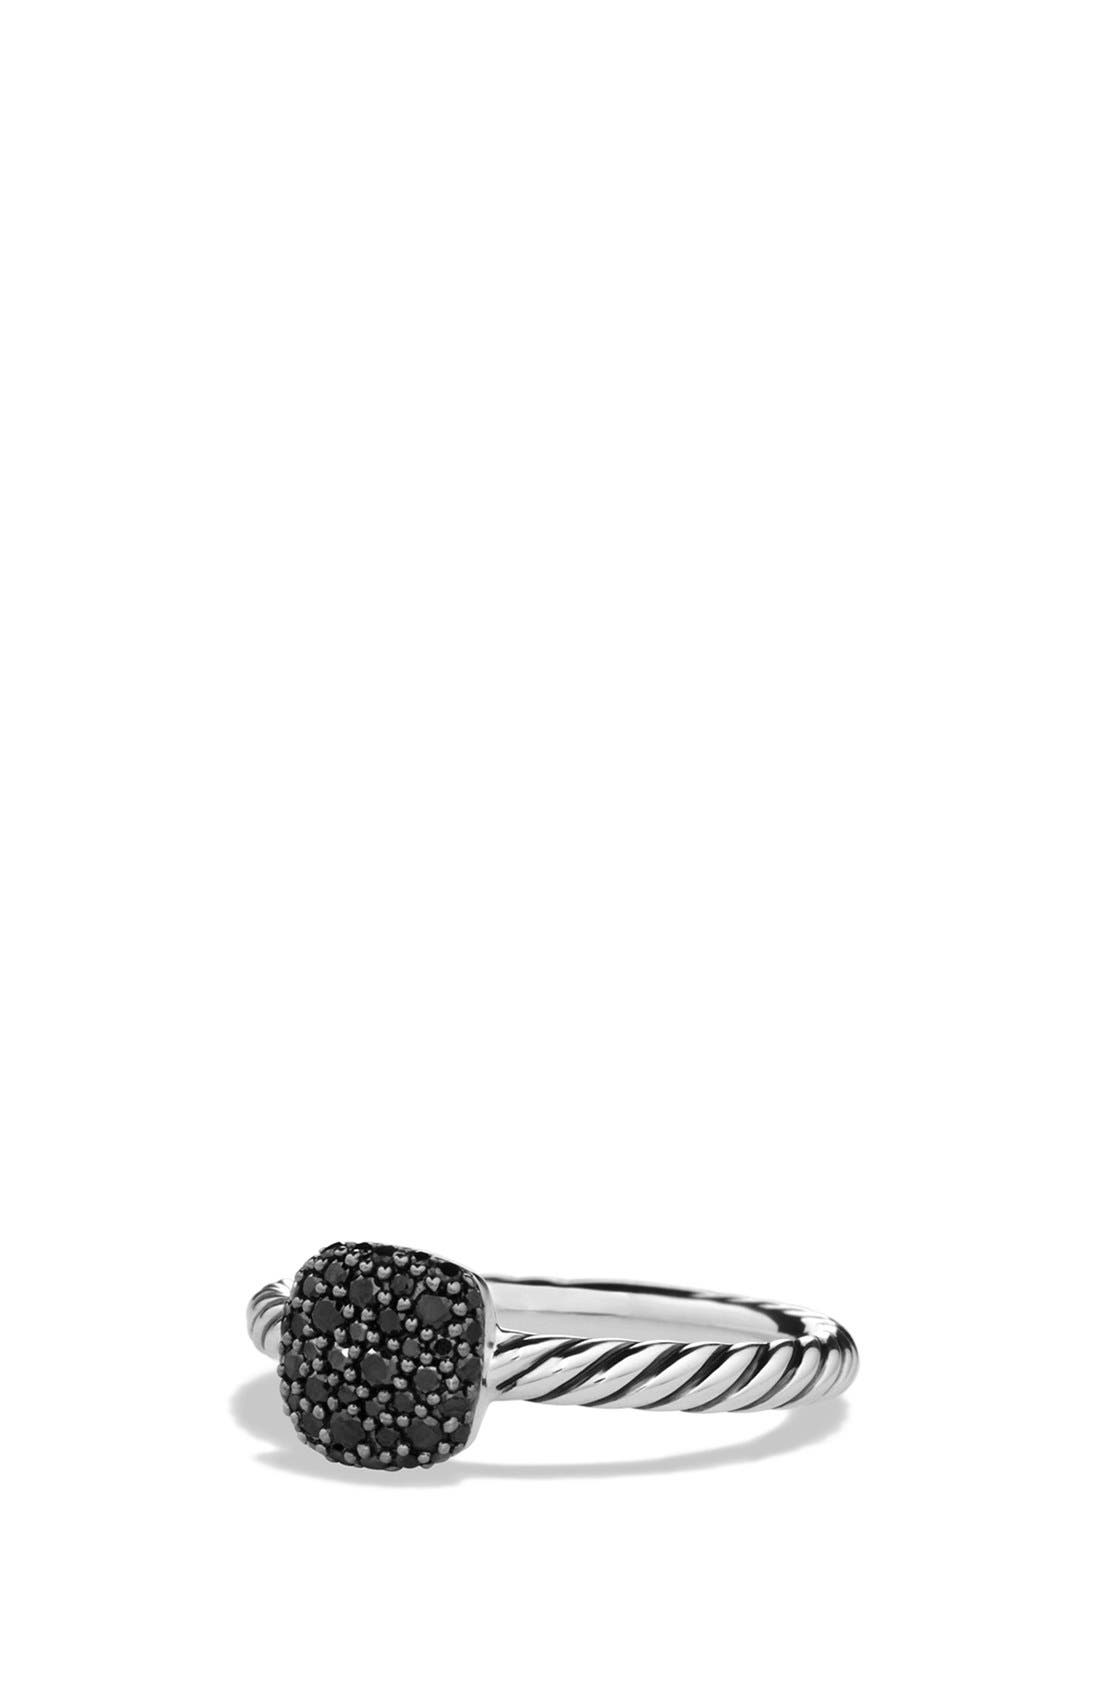 Alternate Image 1 Selected - David Yurman 'Pavé' Cushion Ring with Black Diamonds